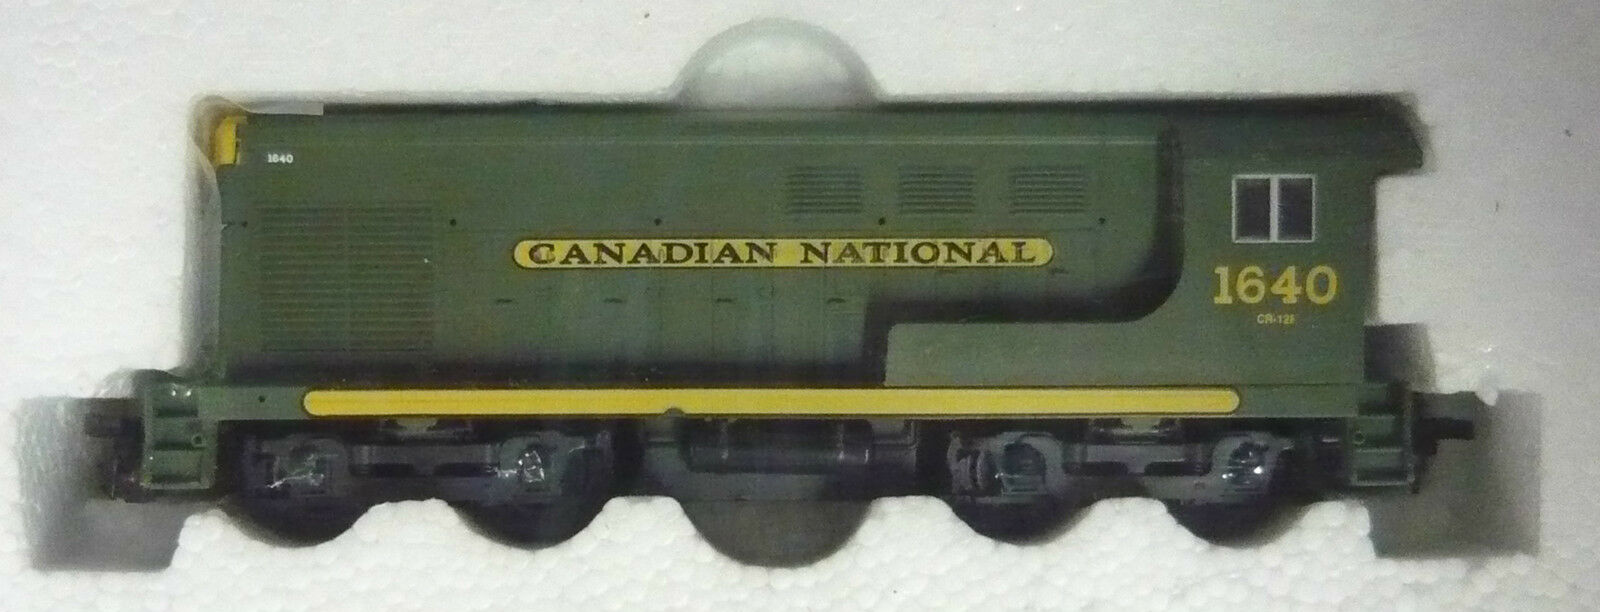 Walthers 932-1311, Diesel locomotiva h12-44  1640, Canadian National, h0, neu&ovp